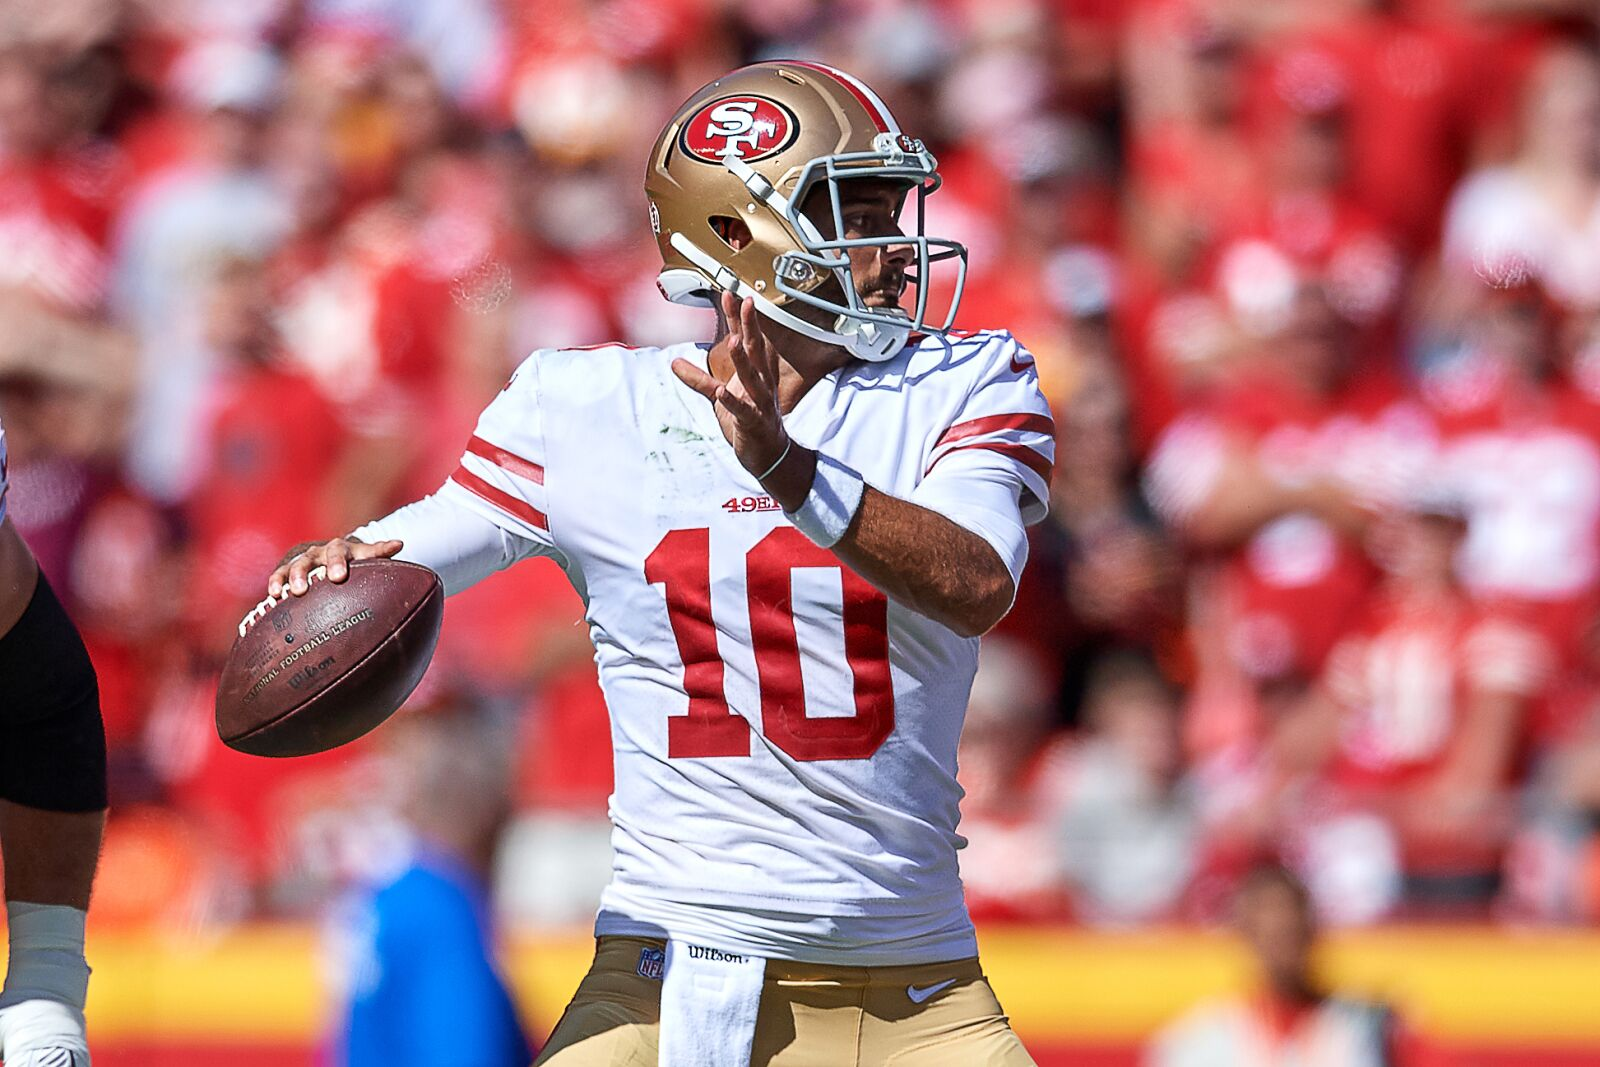 fa5fc3e8 NFL News: 49ers finally give Jimmy Garoppolo the green light